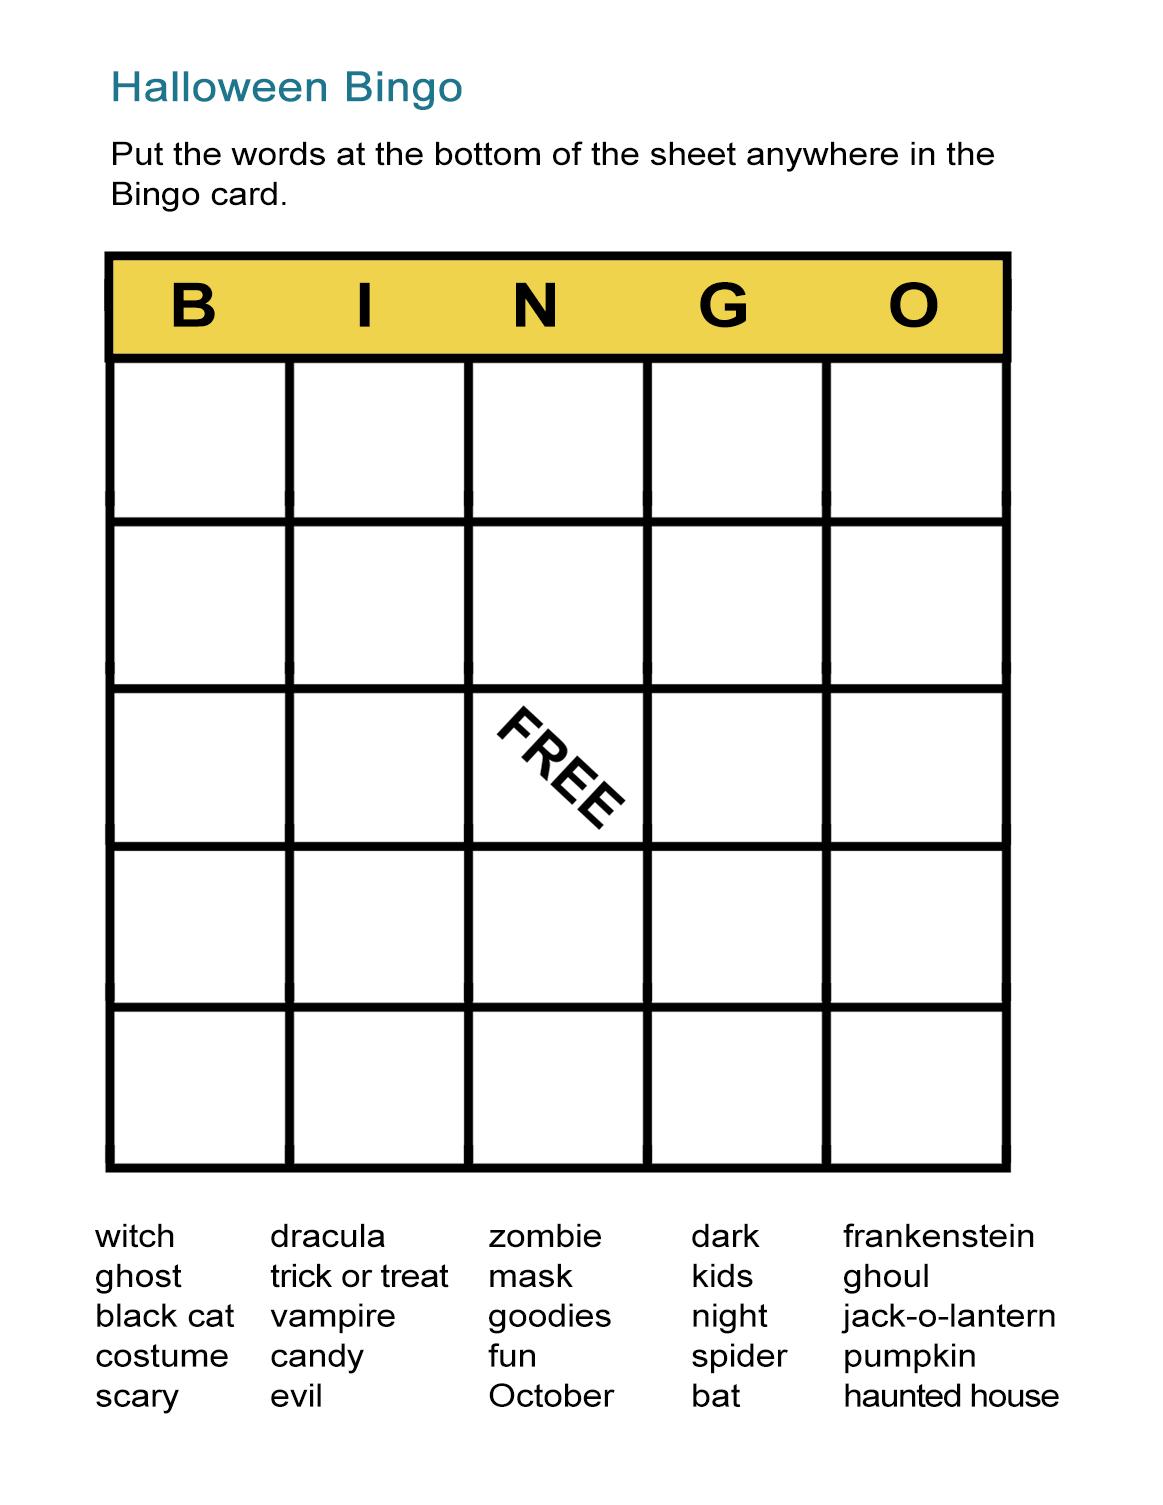 Halloween Bingo Cards: Printable Bingo Games For Class - All Esl - Free Printable Bingo Games